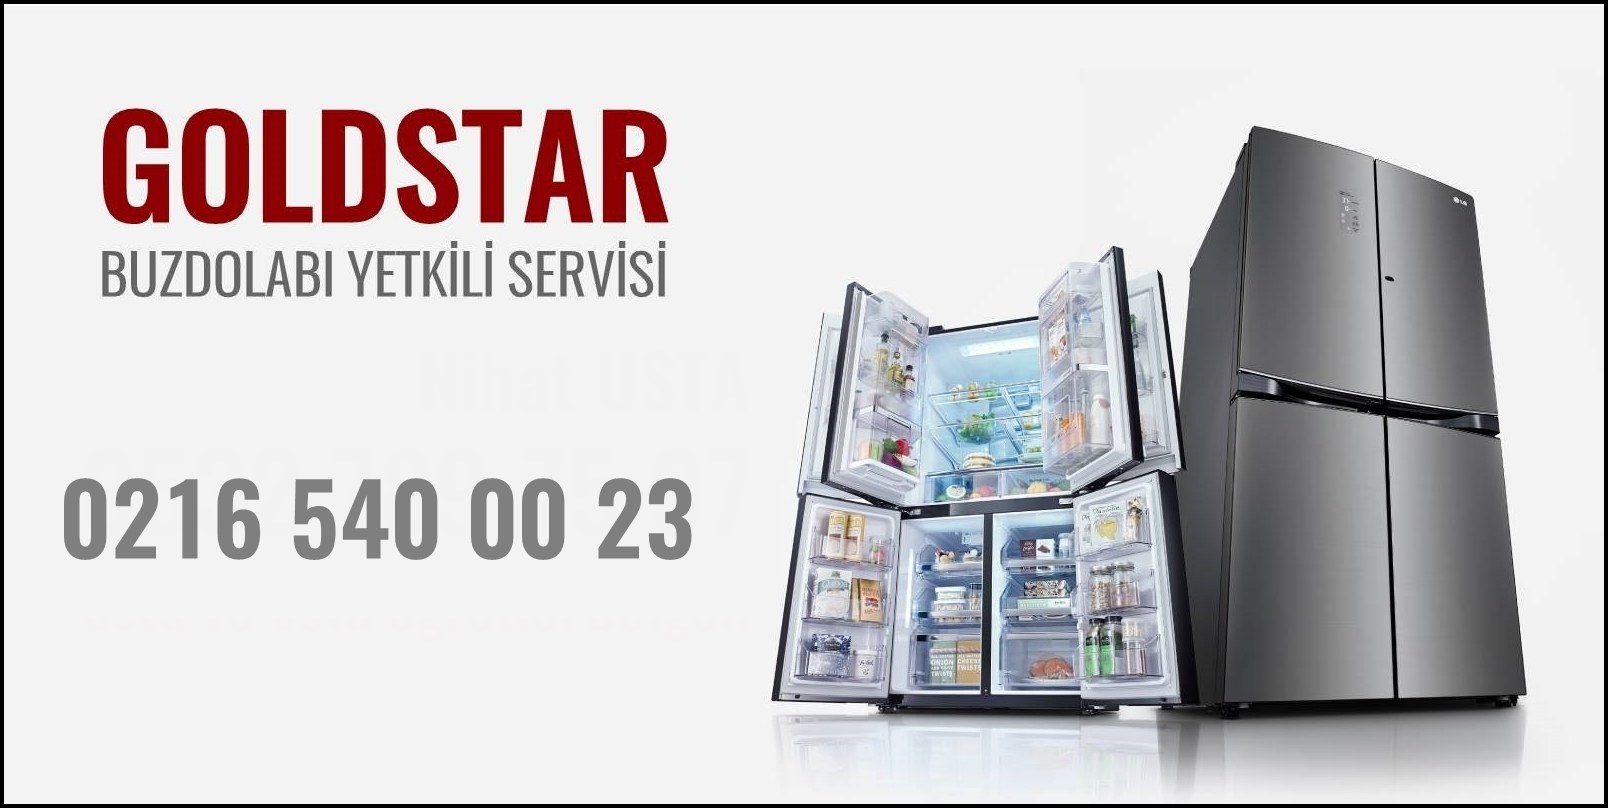 Taşdelen Goldstar Servisi